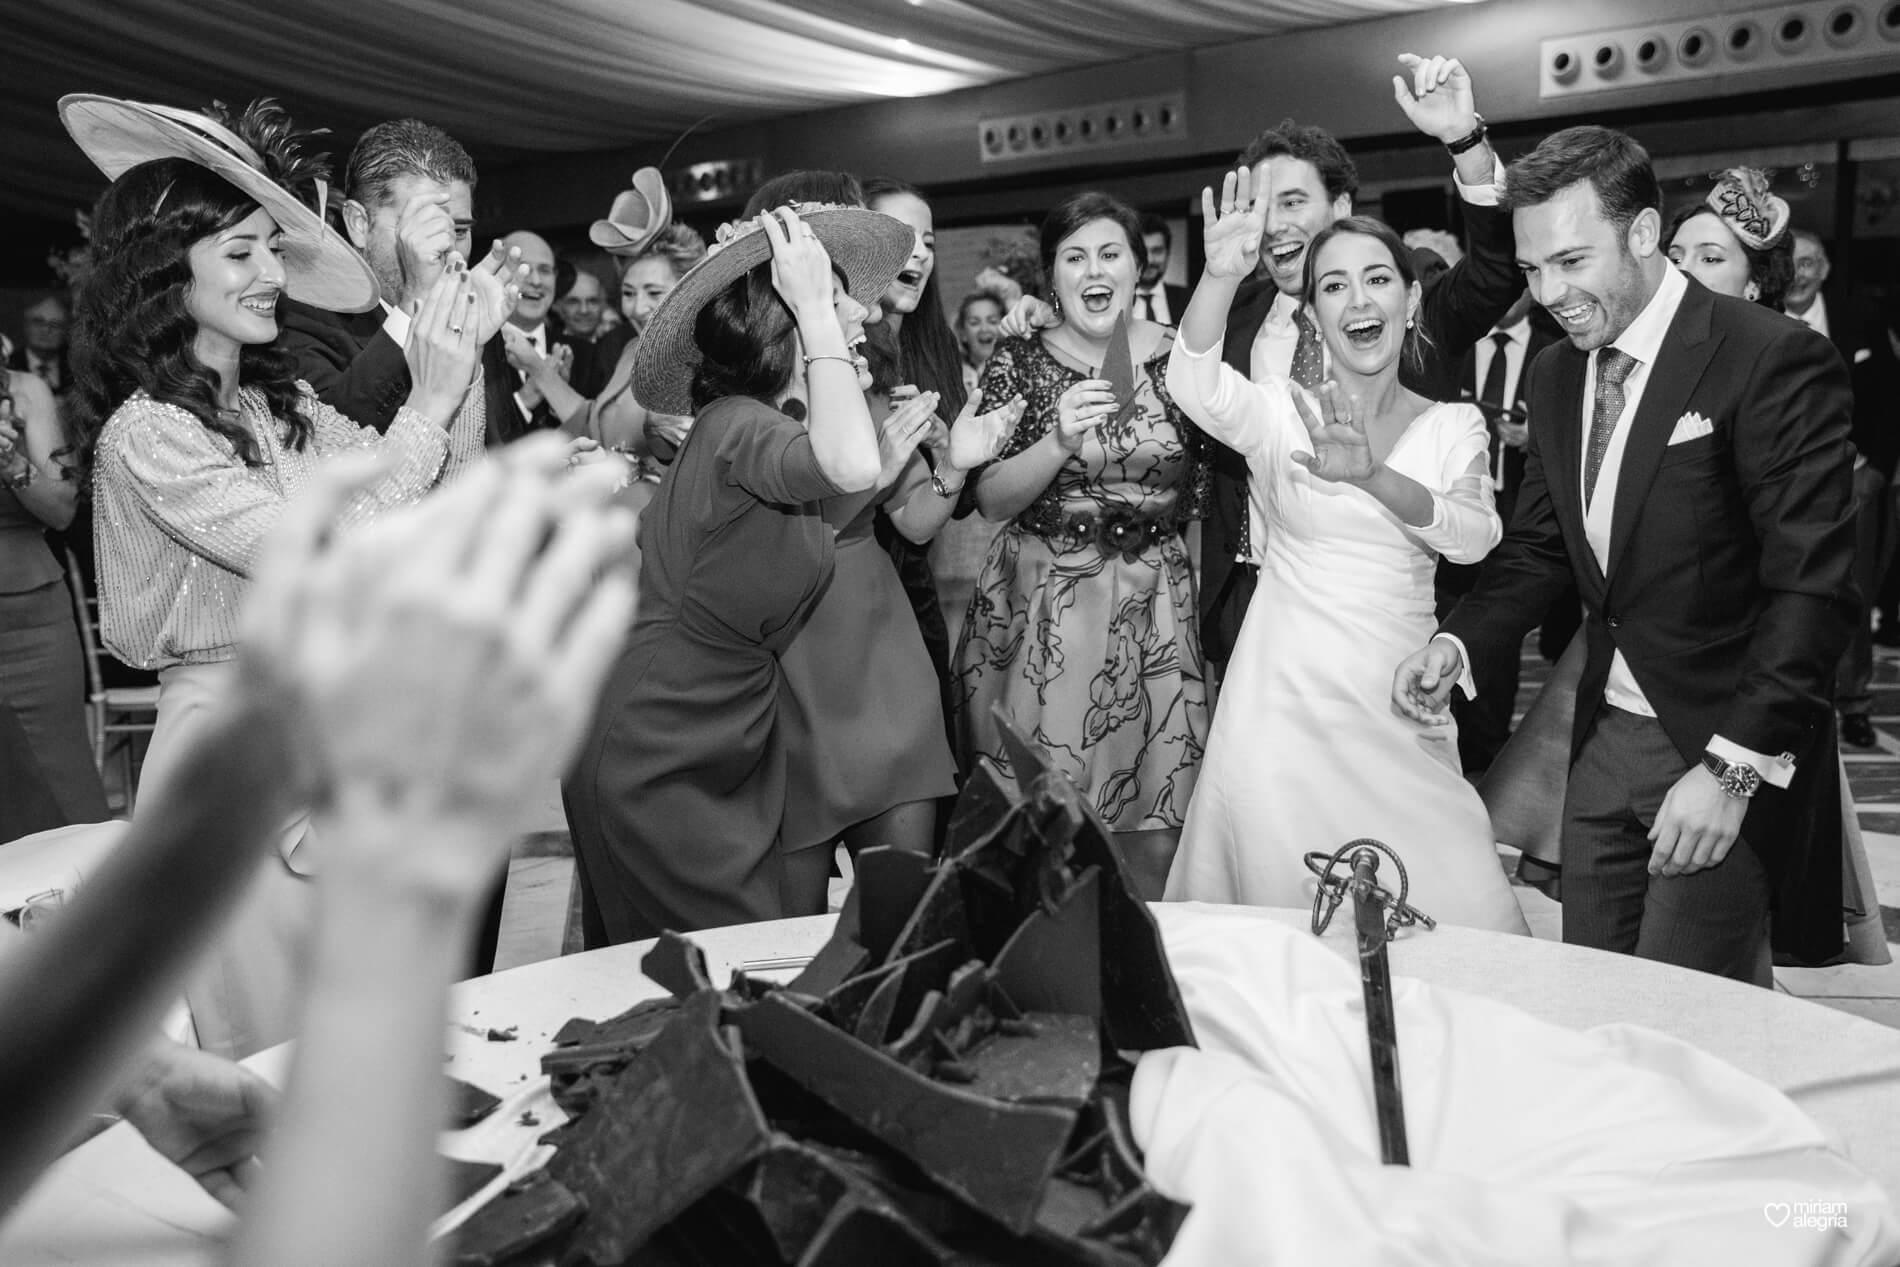 vestido-de-novia-paula-del-vas-miriam-alegria-fotografos-boda-murcia-136